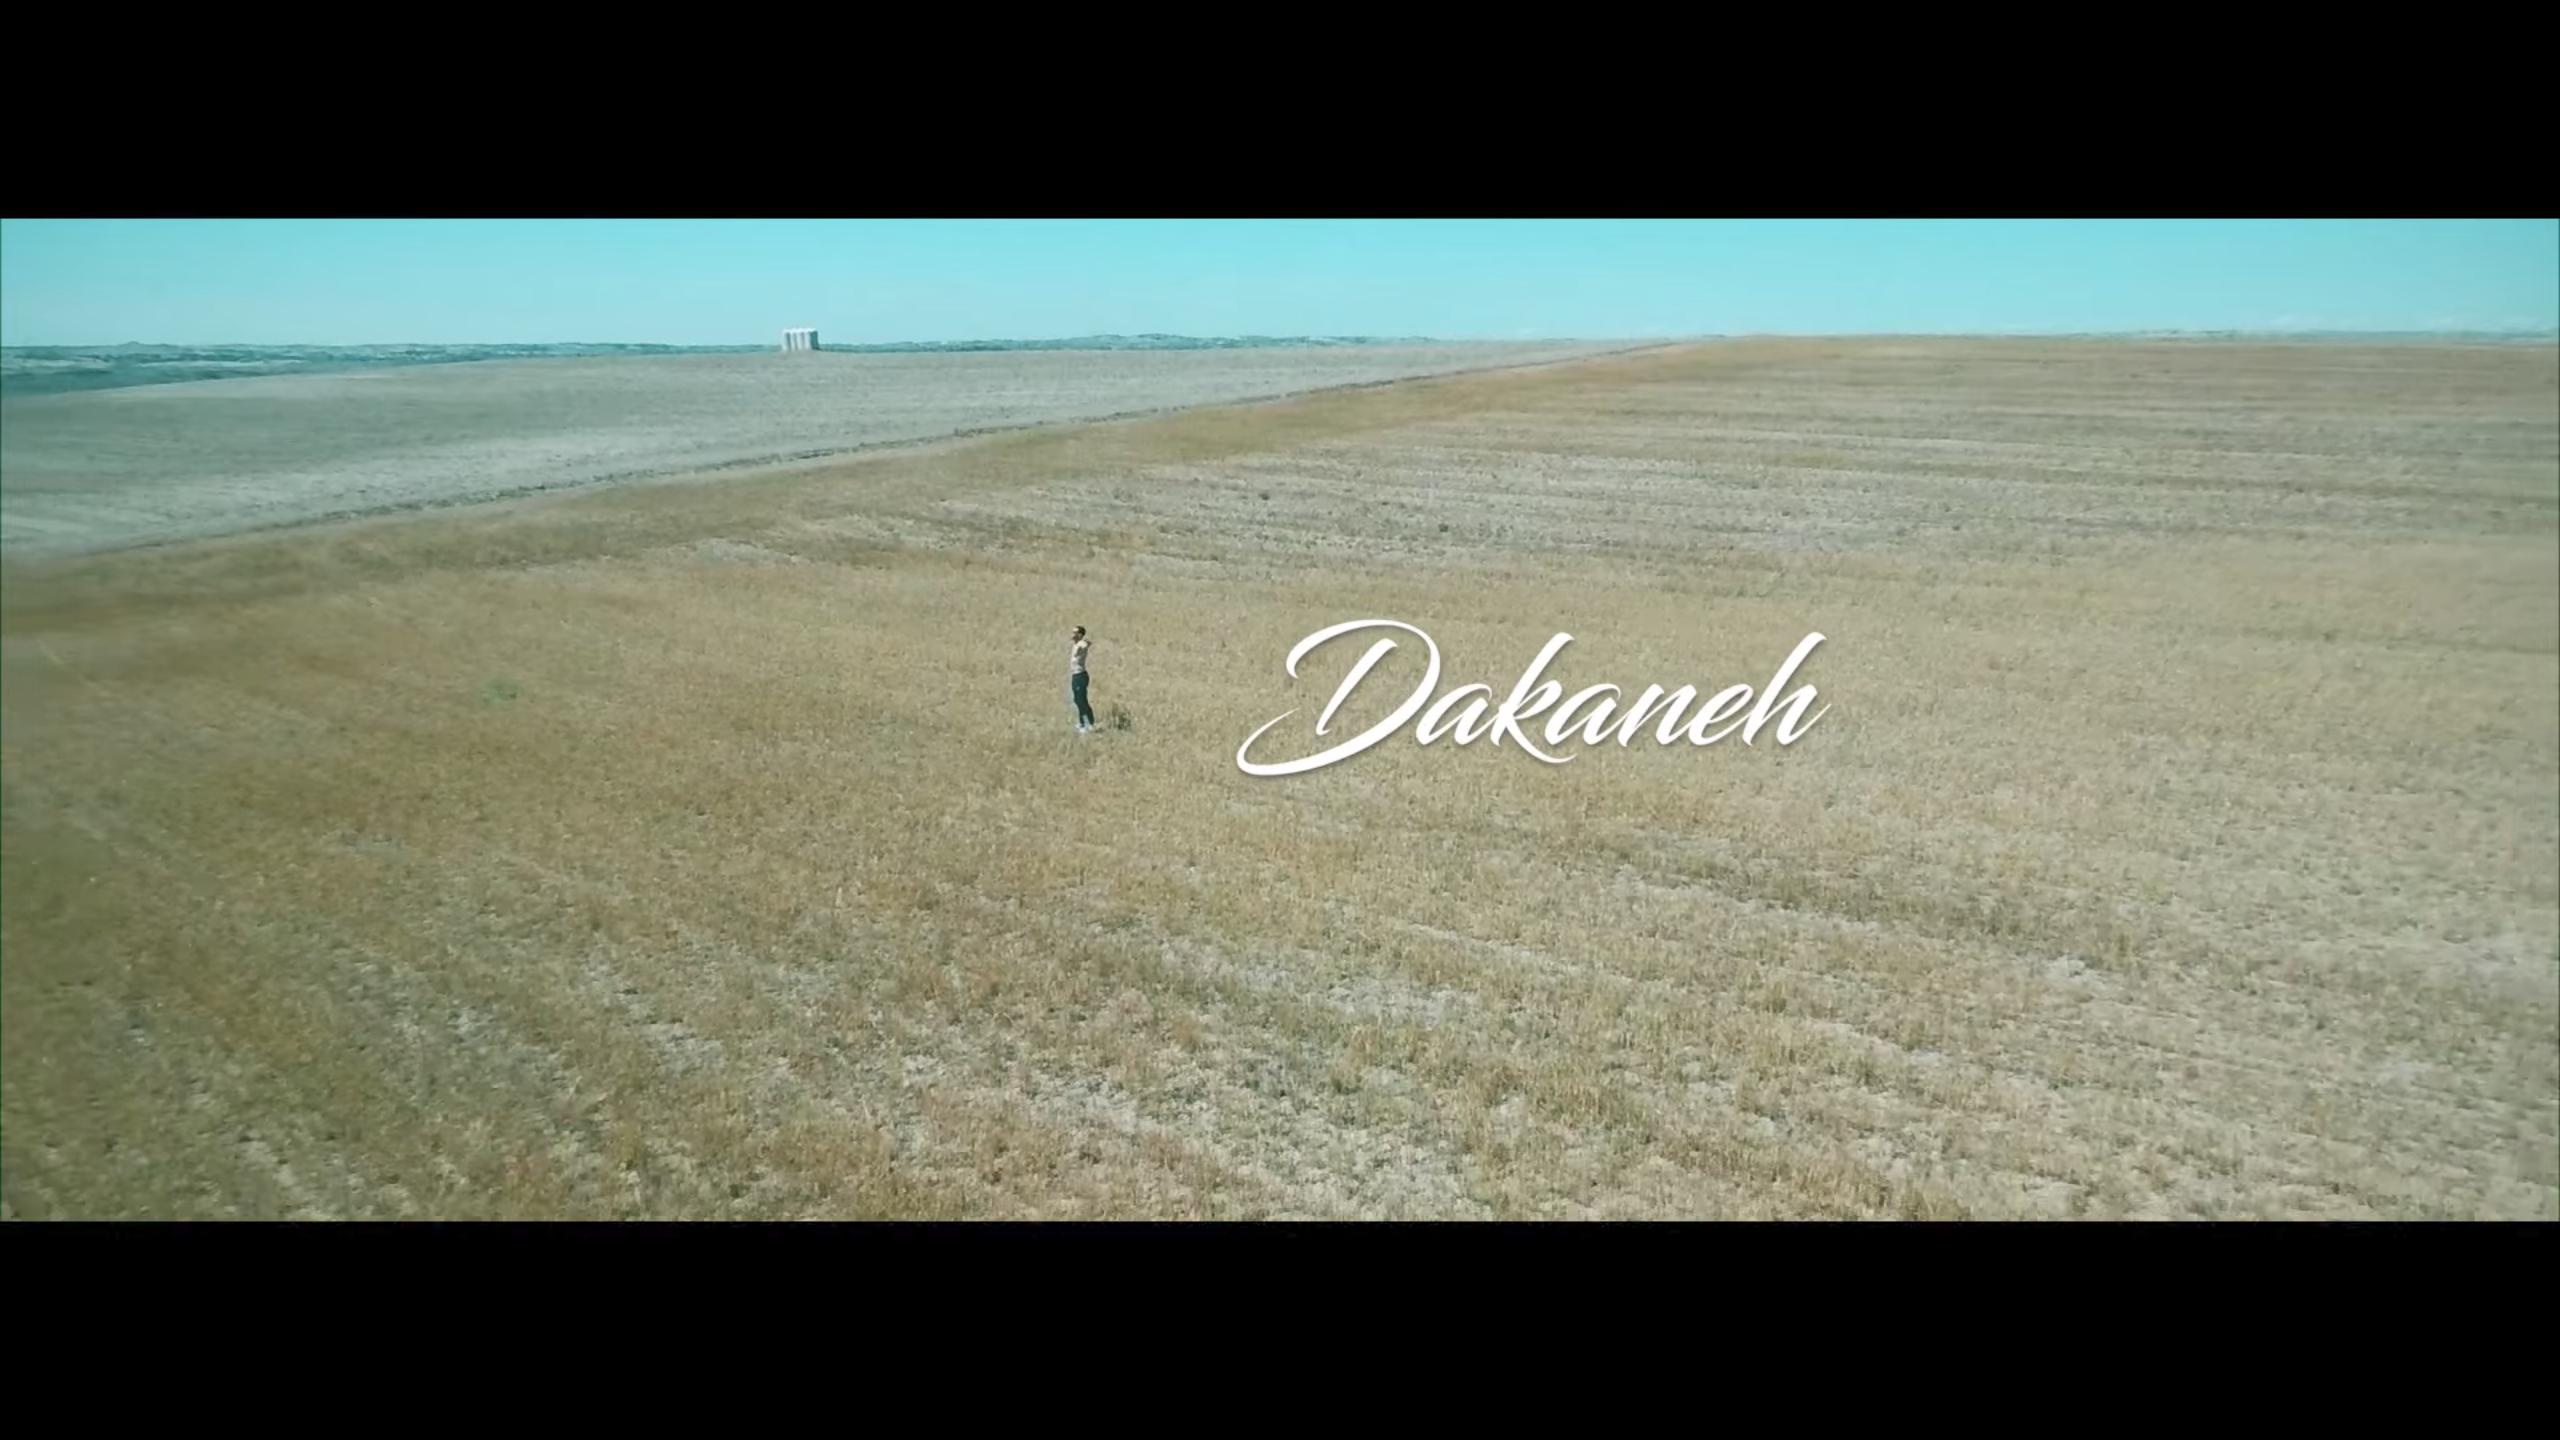 Dakaneh